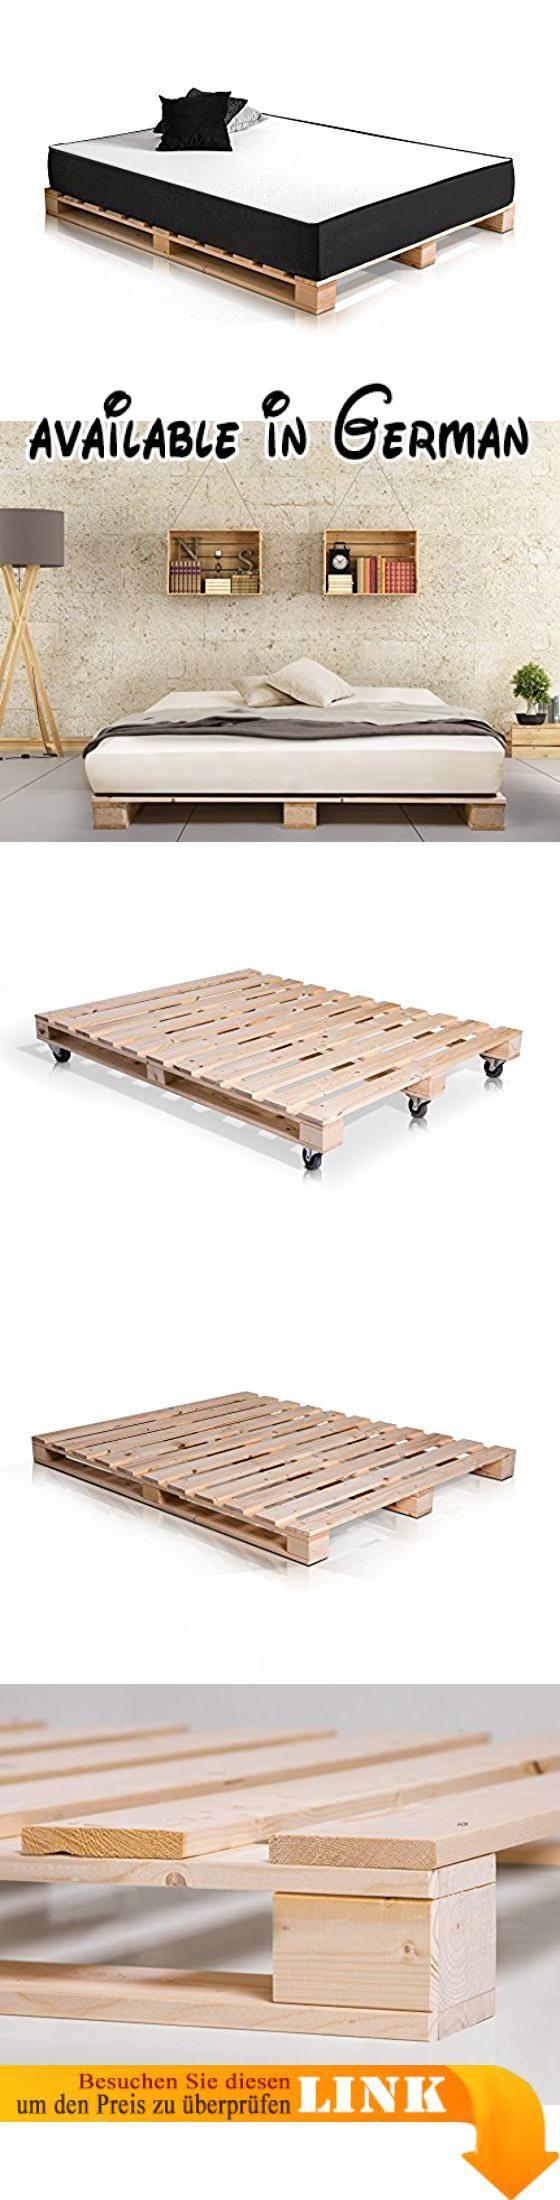 B01I3RBFDW : PALETTI Massivholzbett Holzbett Palettenbett Bett aus ...